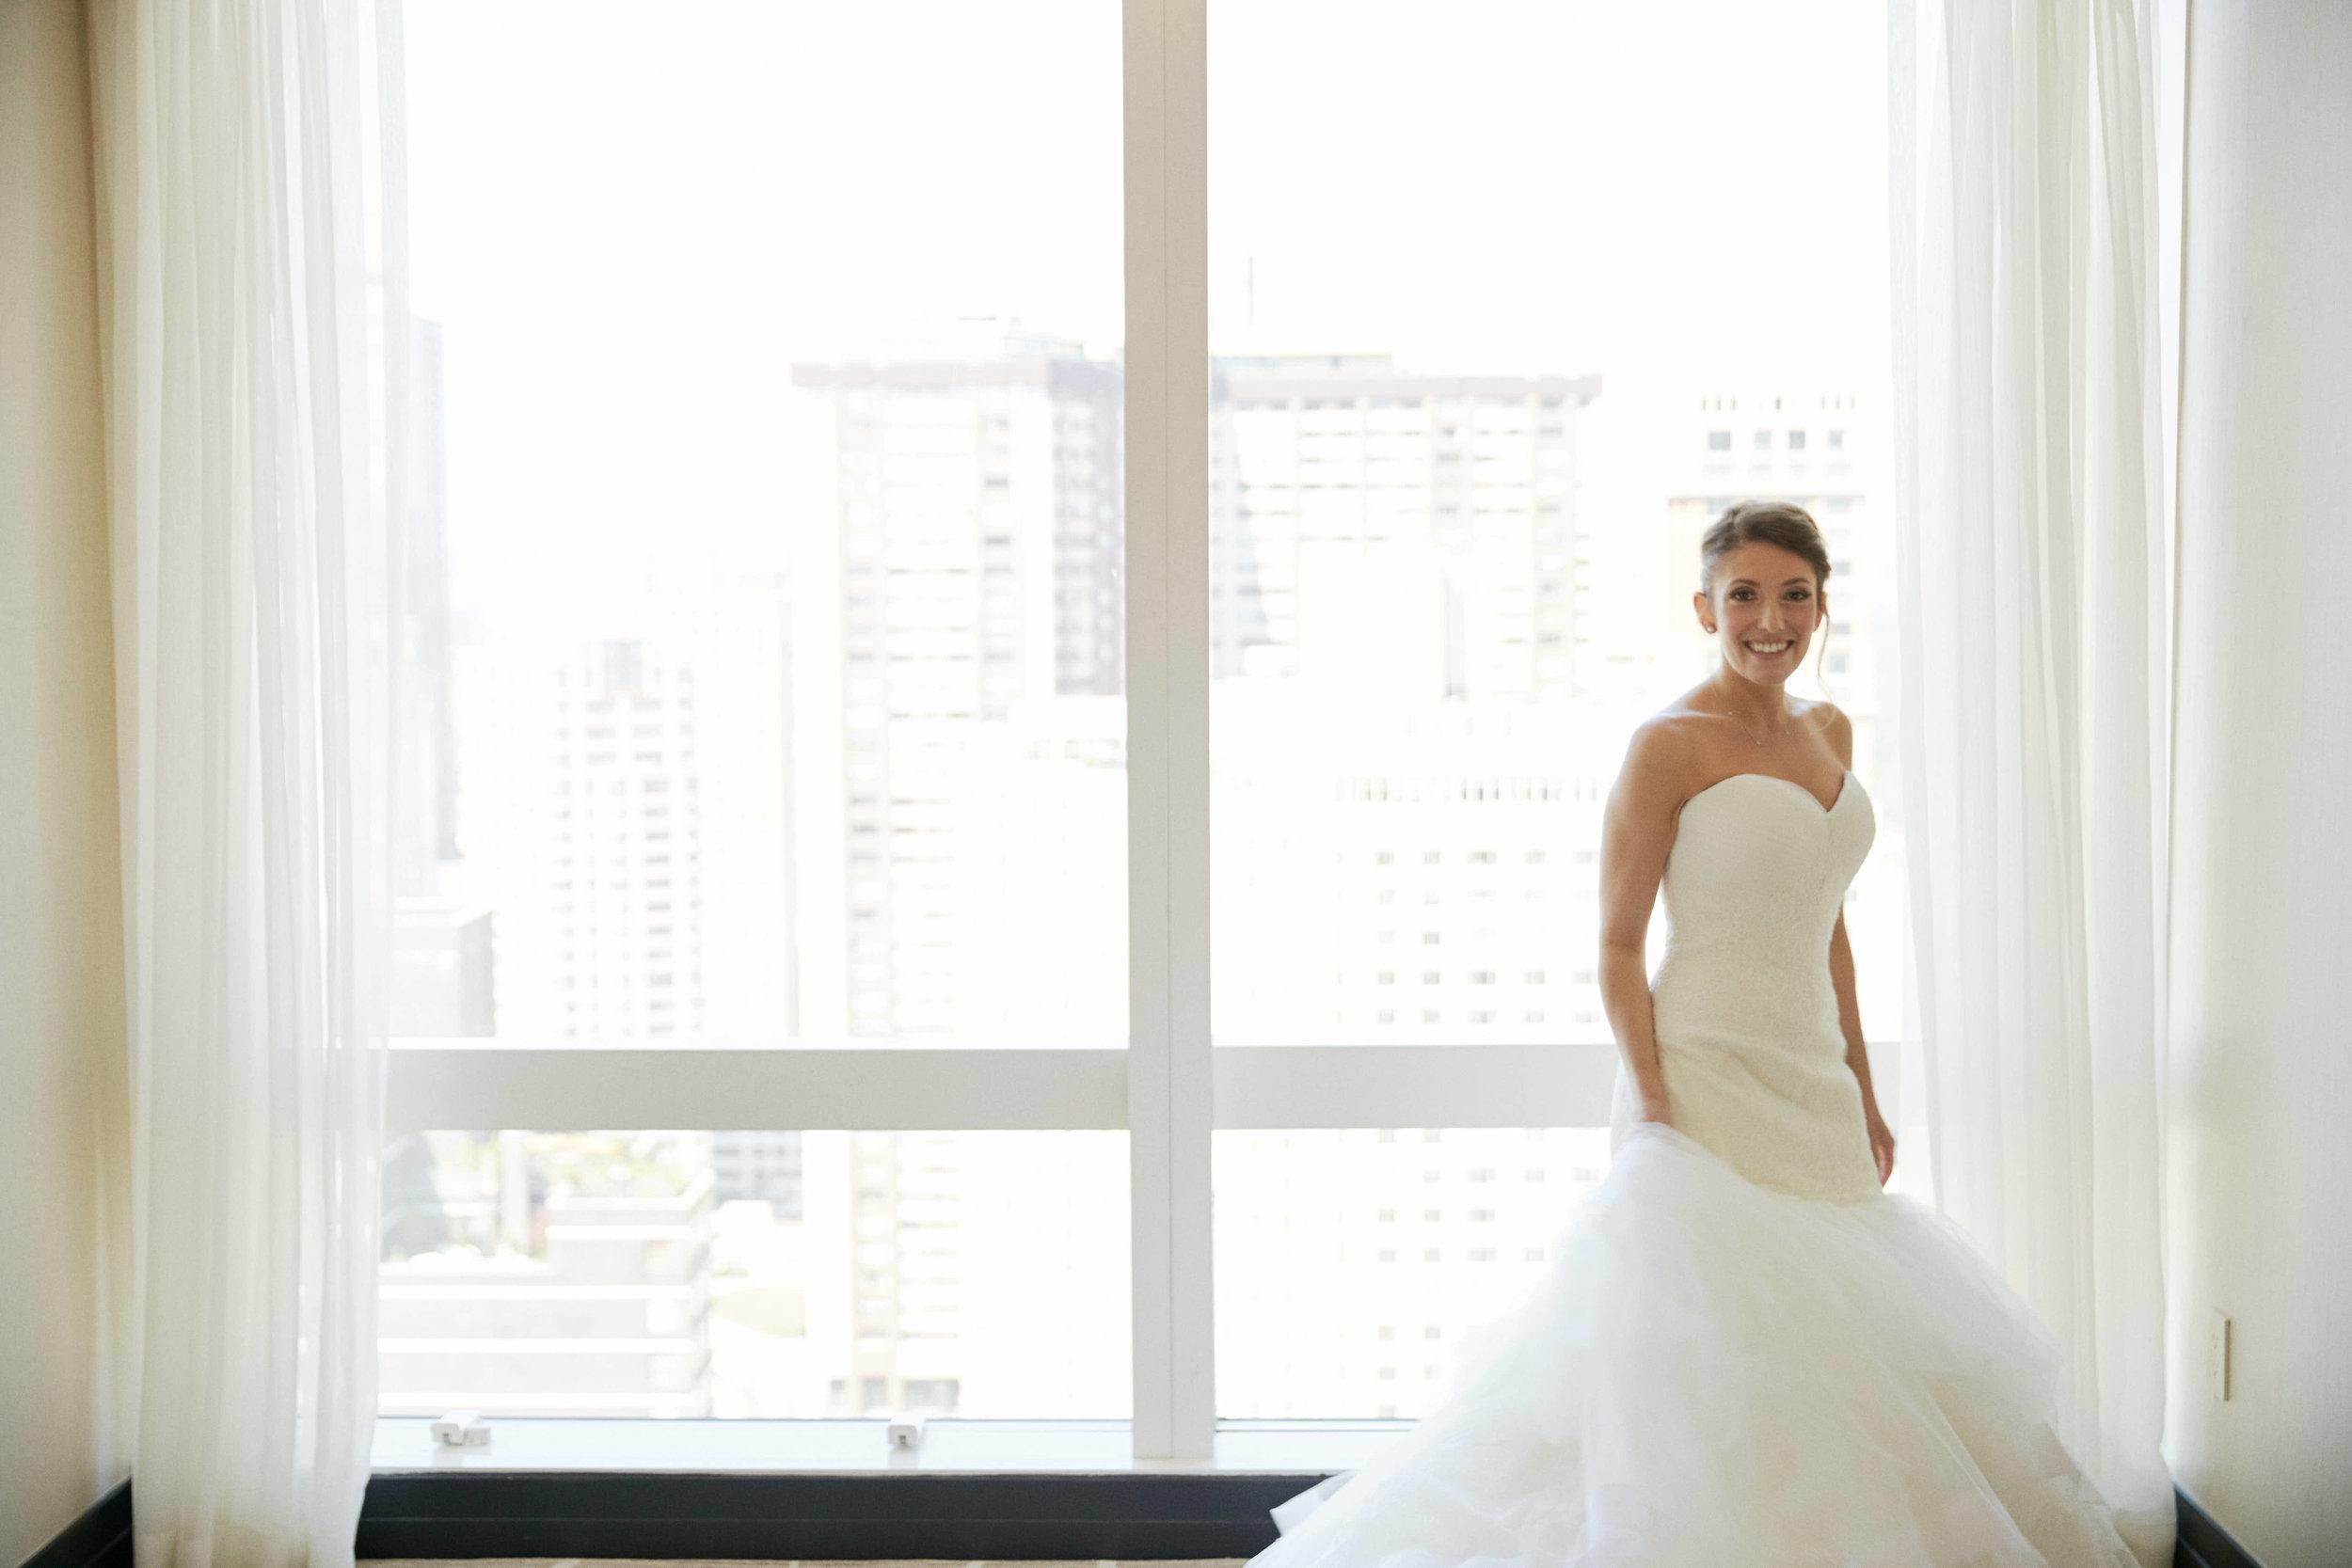 wedding-dress-nyc-wedding-pink-bowtie